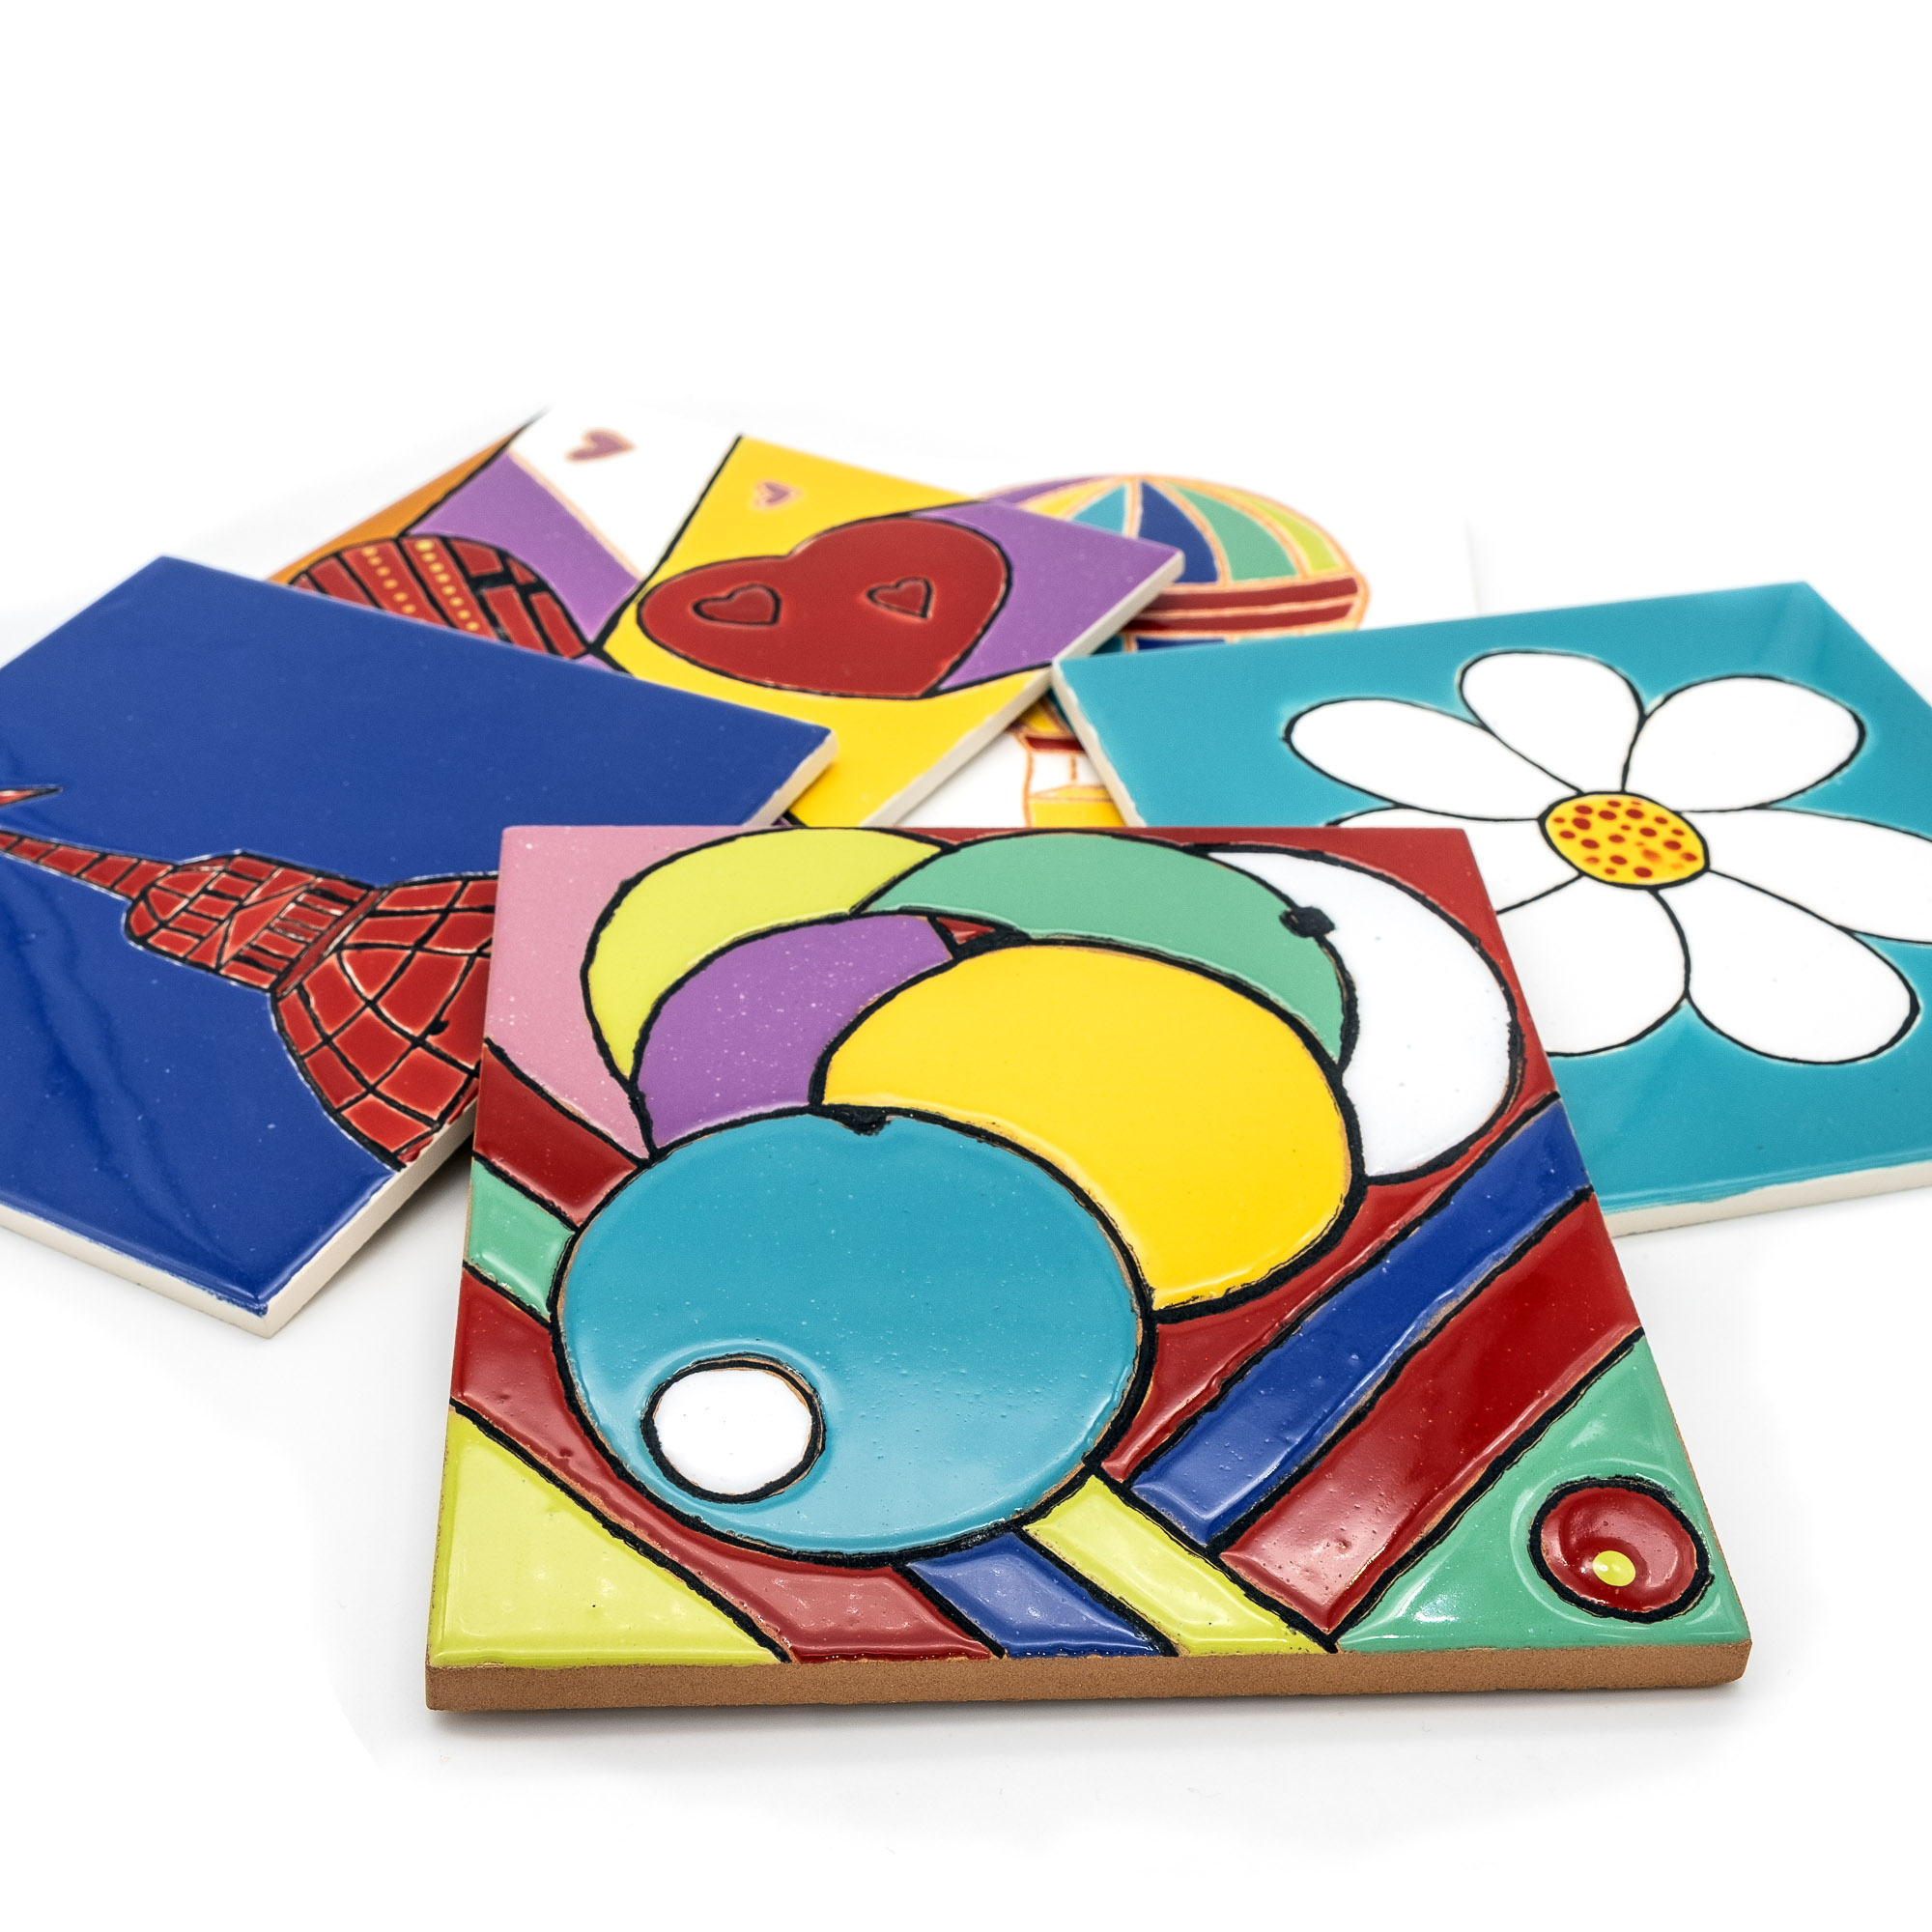 Piastrelle in Ceramica - Stefania Mairano Creazioni in Ceramica